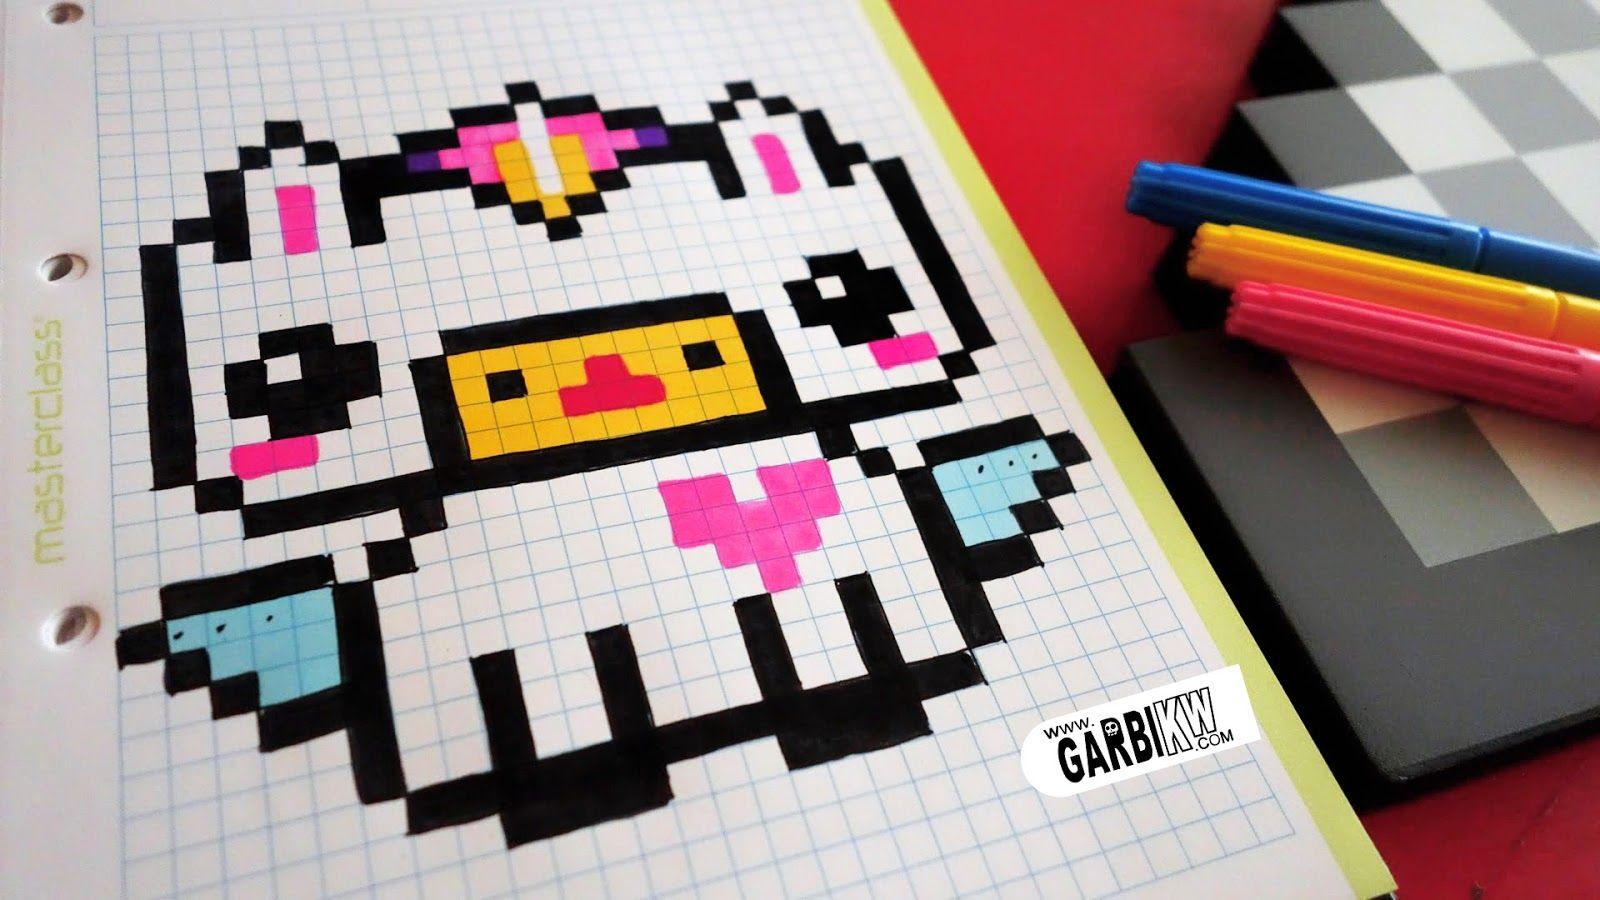 Resultat De Recherche D Images Pour Pixel Art Kawaii Neat Game